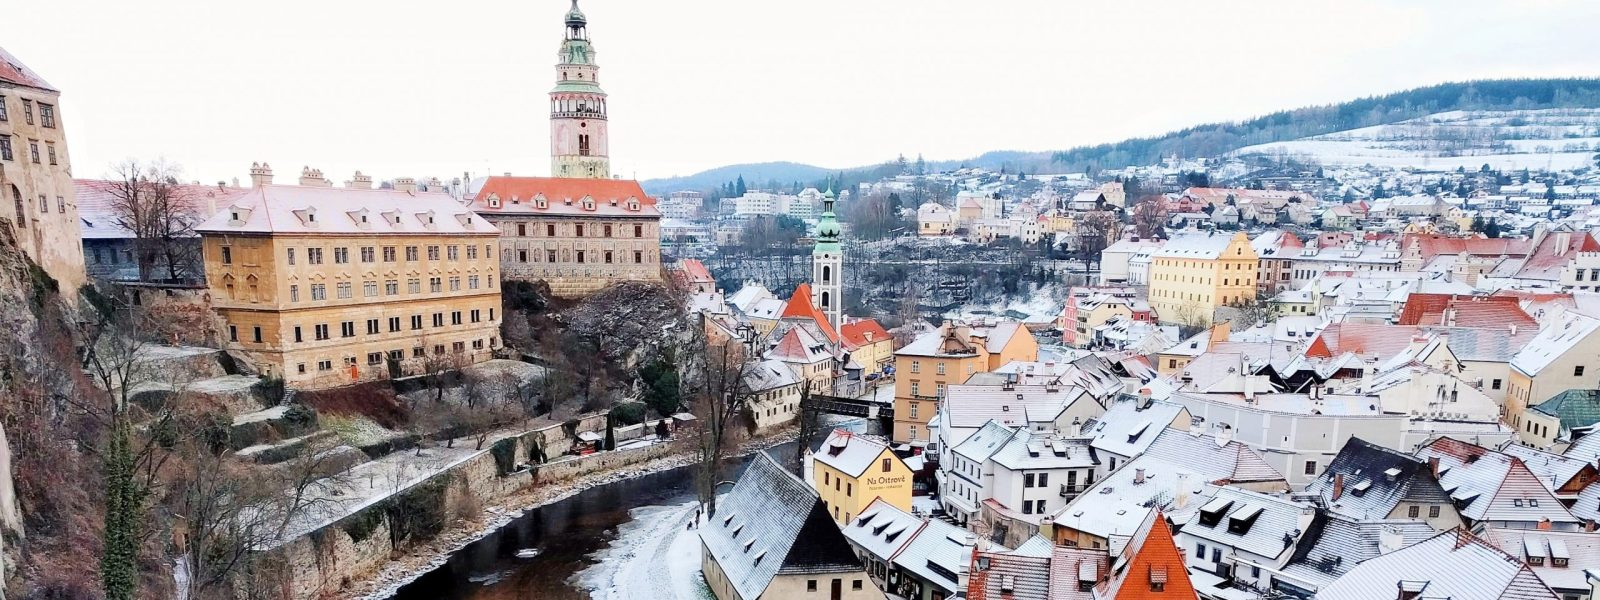 Europese stedentrip in de winter: de 22 leukste winterbestemmingen